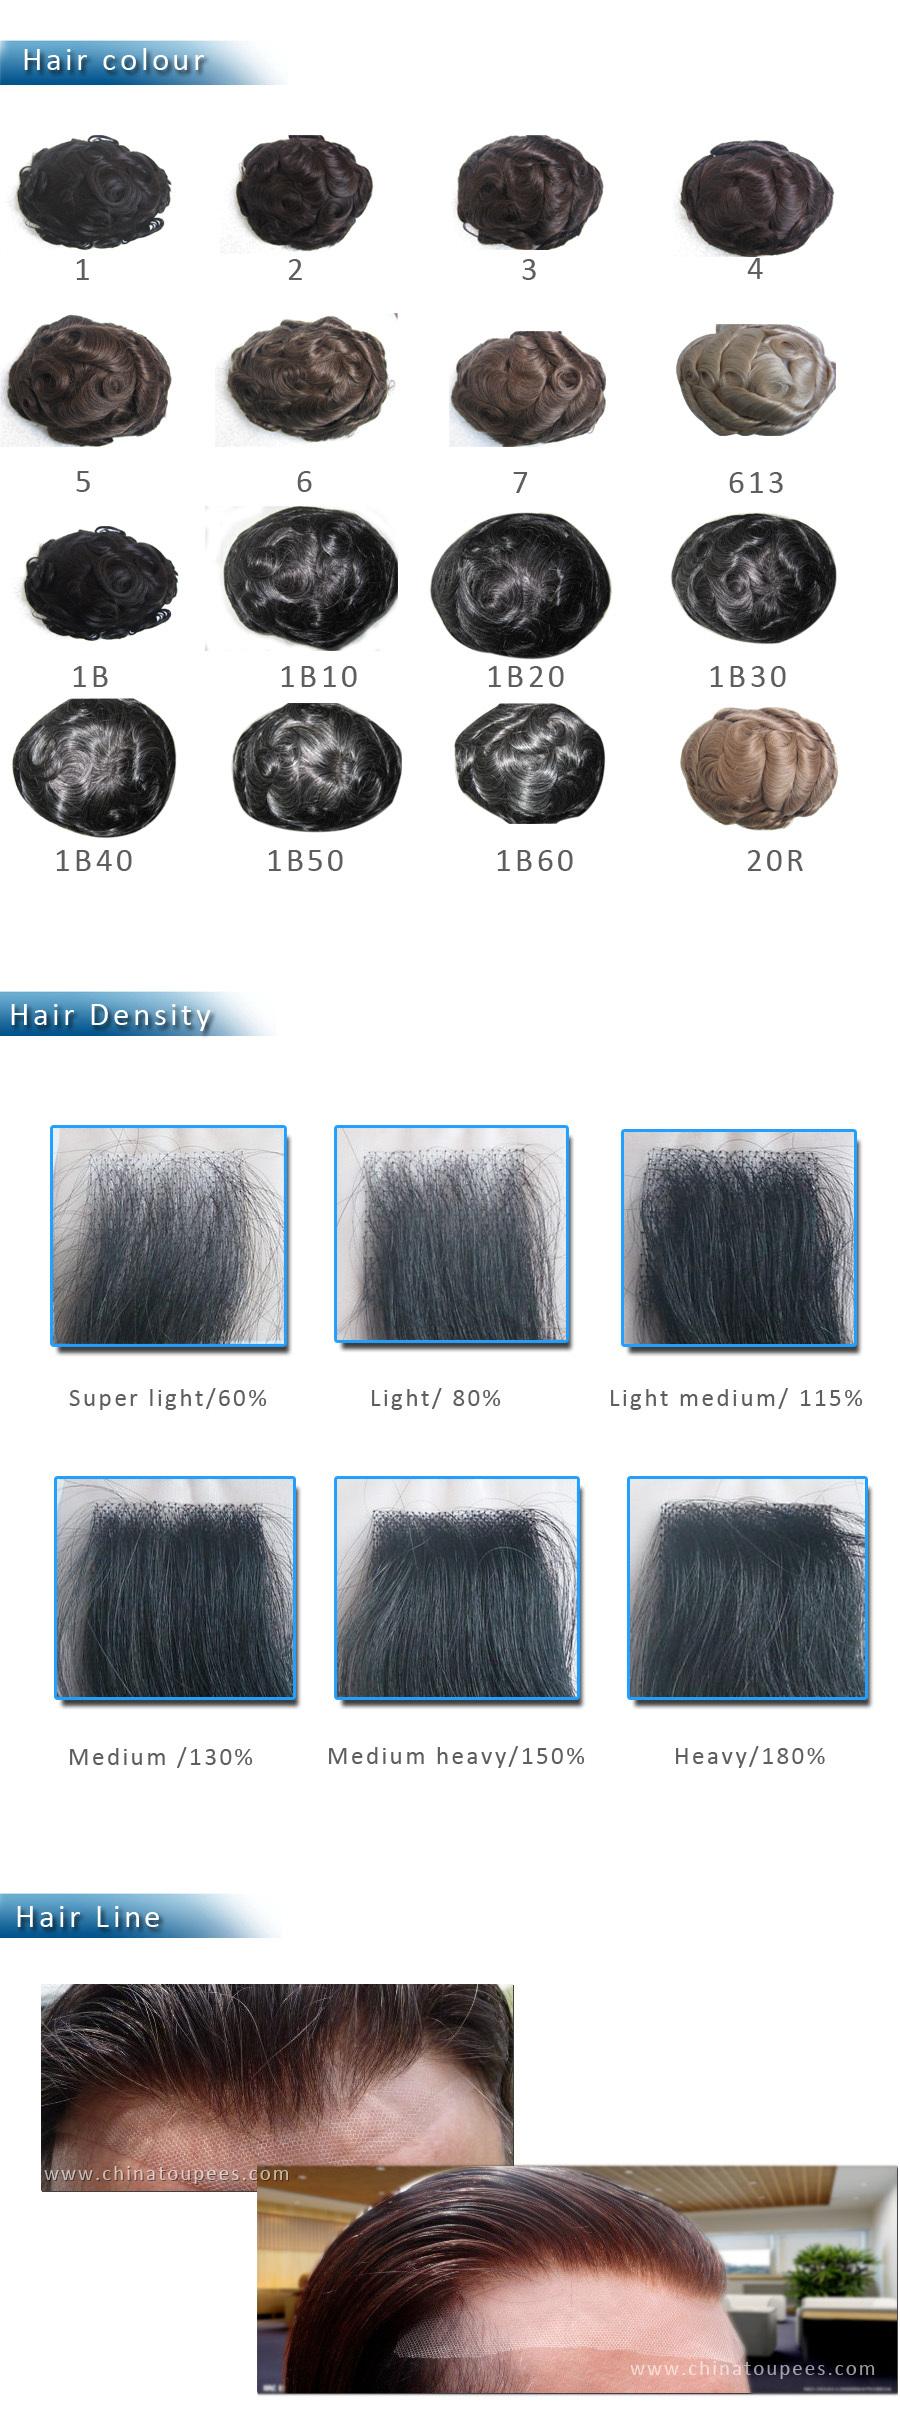 products-1 hair colour.jpg